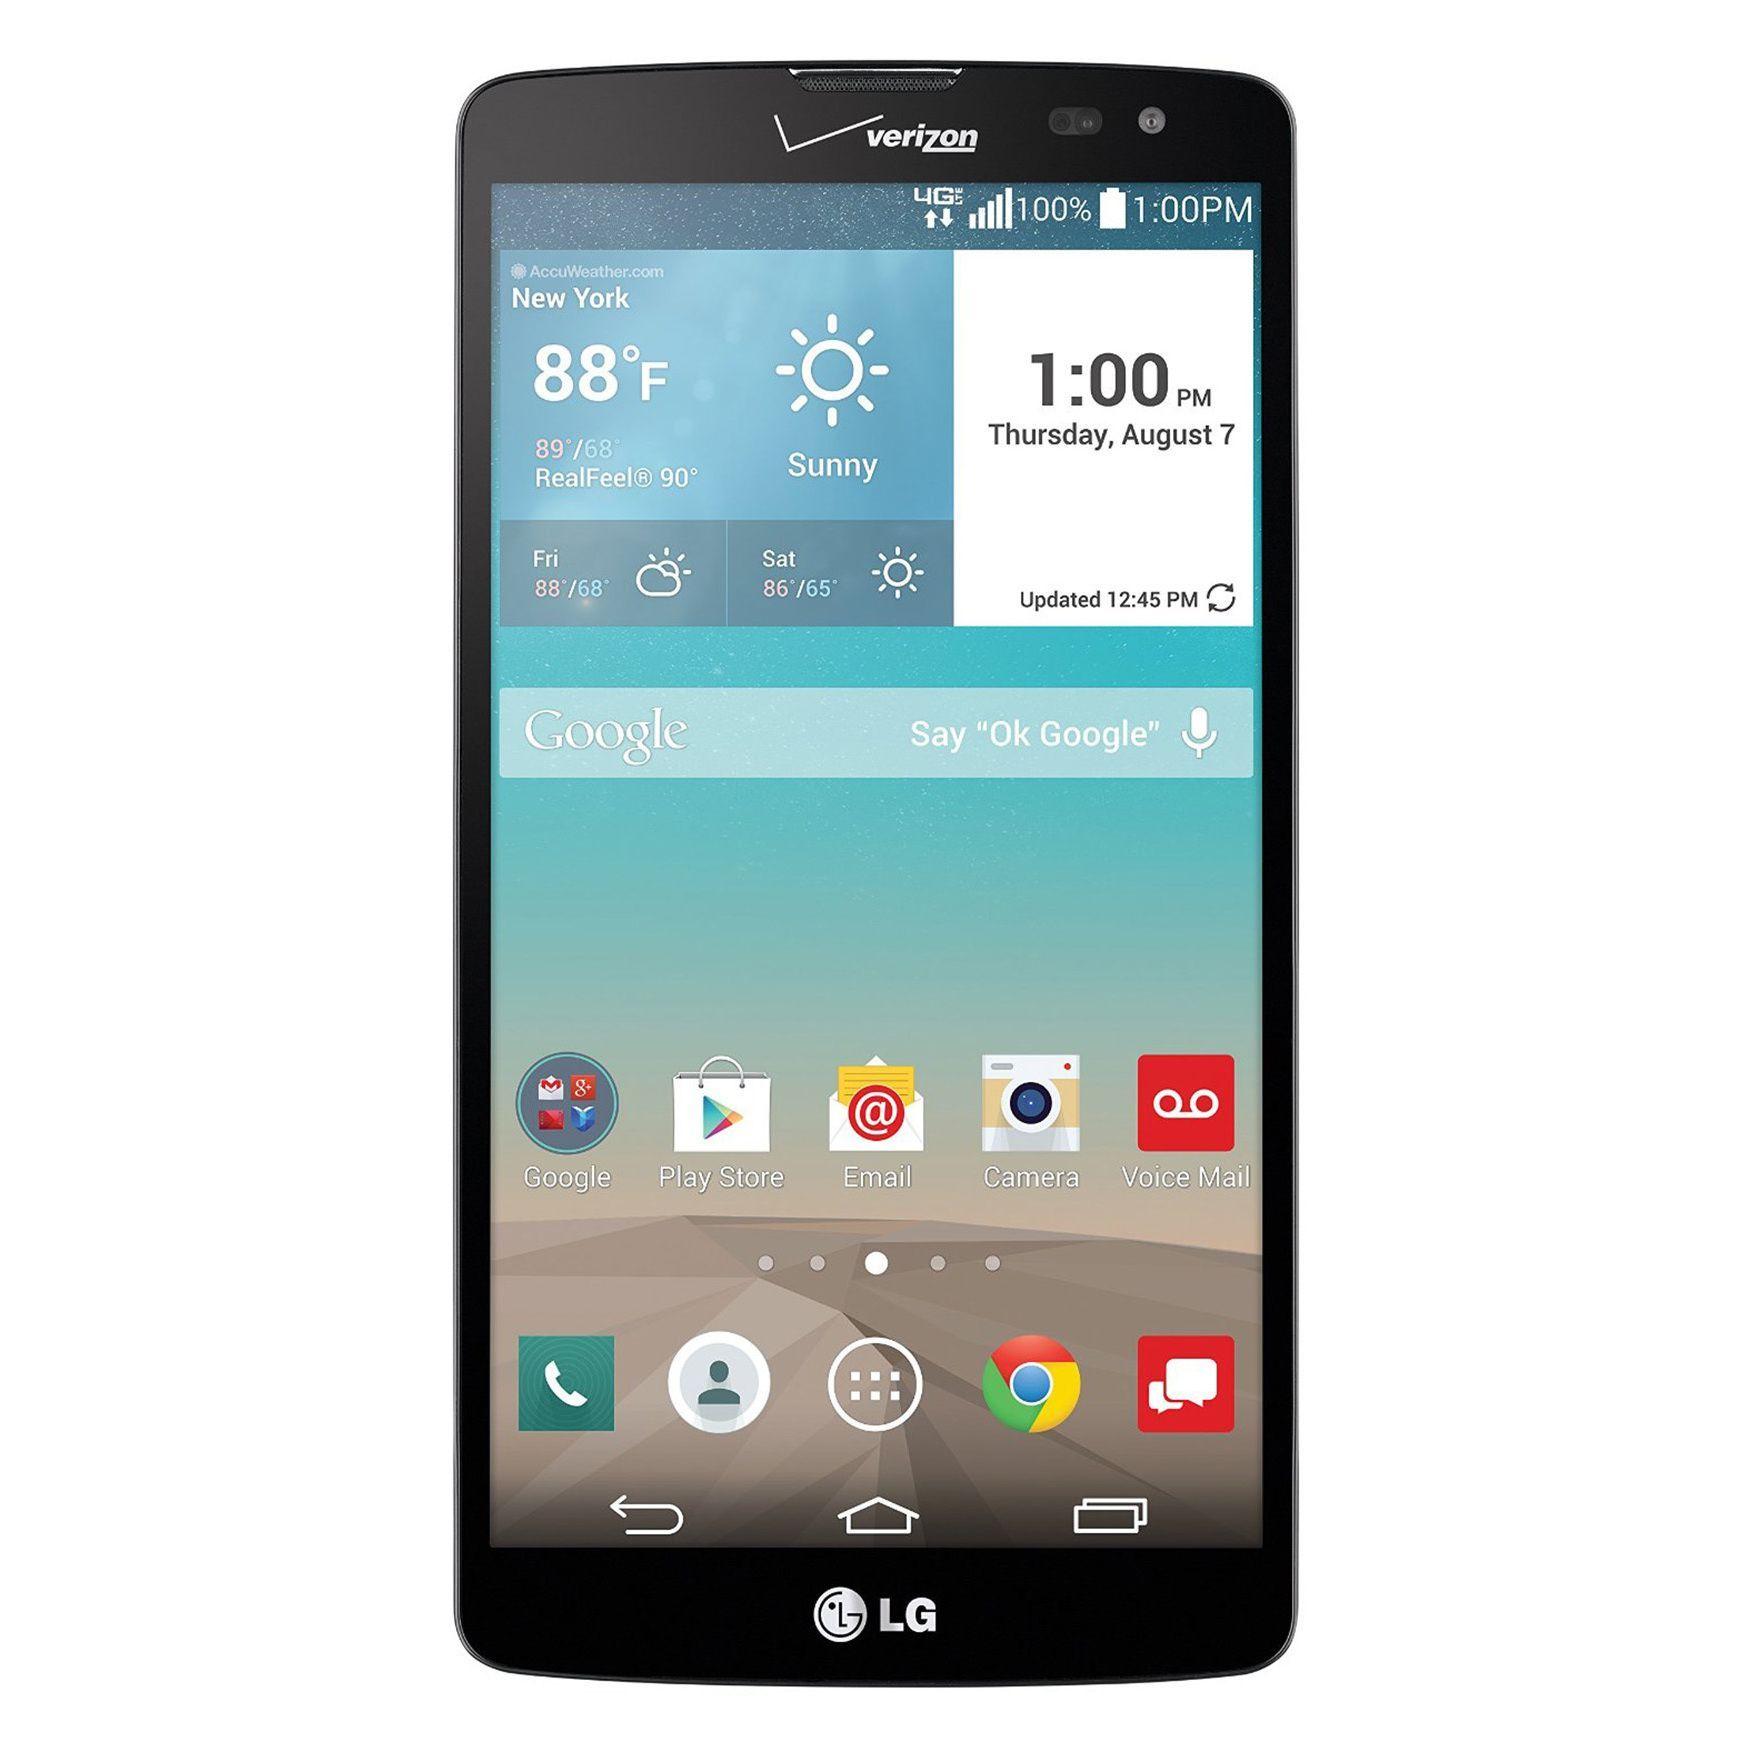 LG G Vista VS880 Verizon Unlocked 4G LTE Quad-Core Android